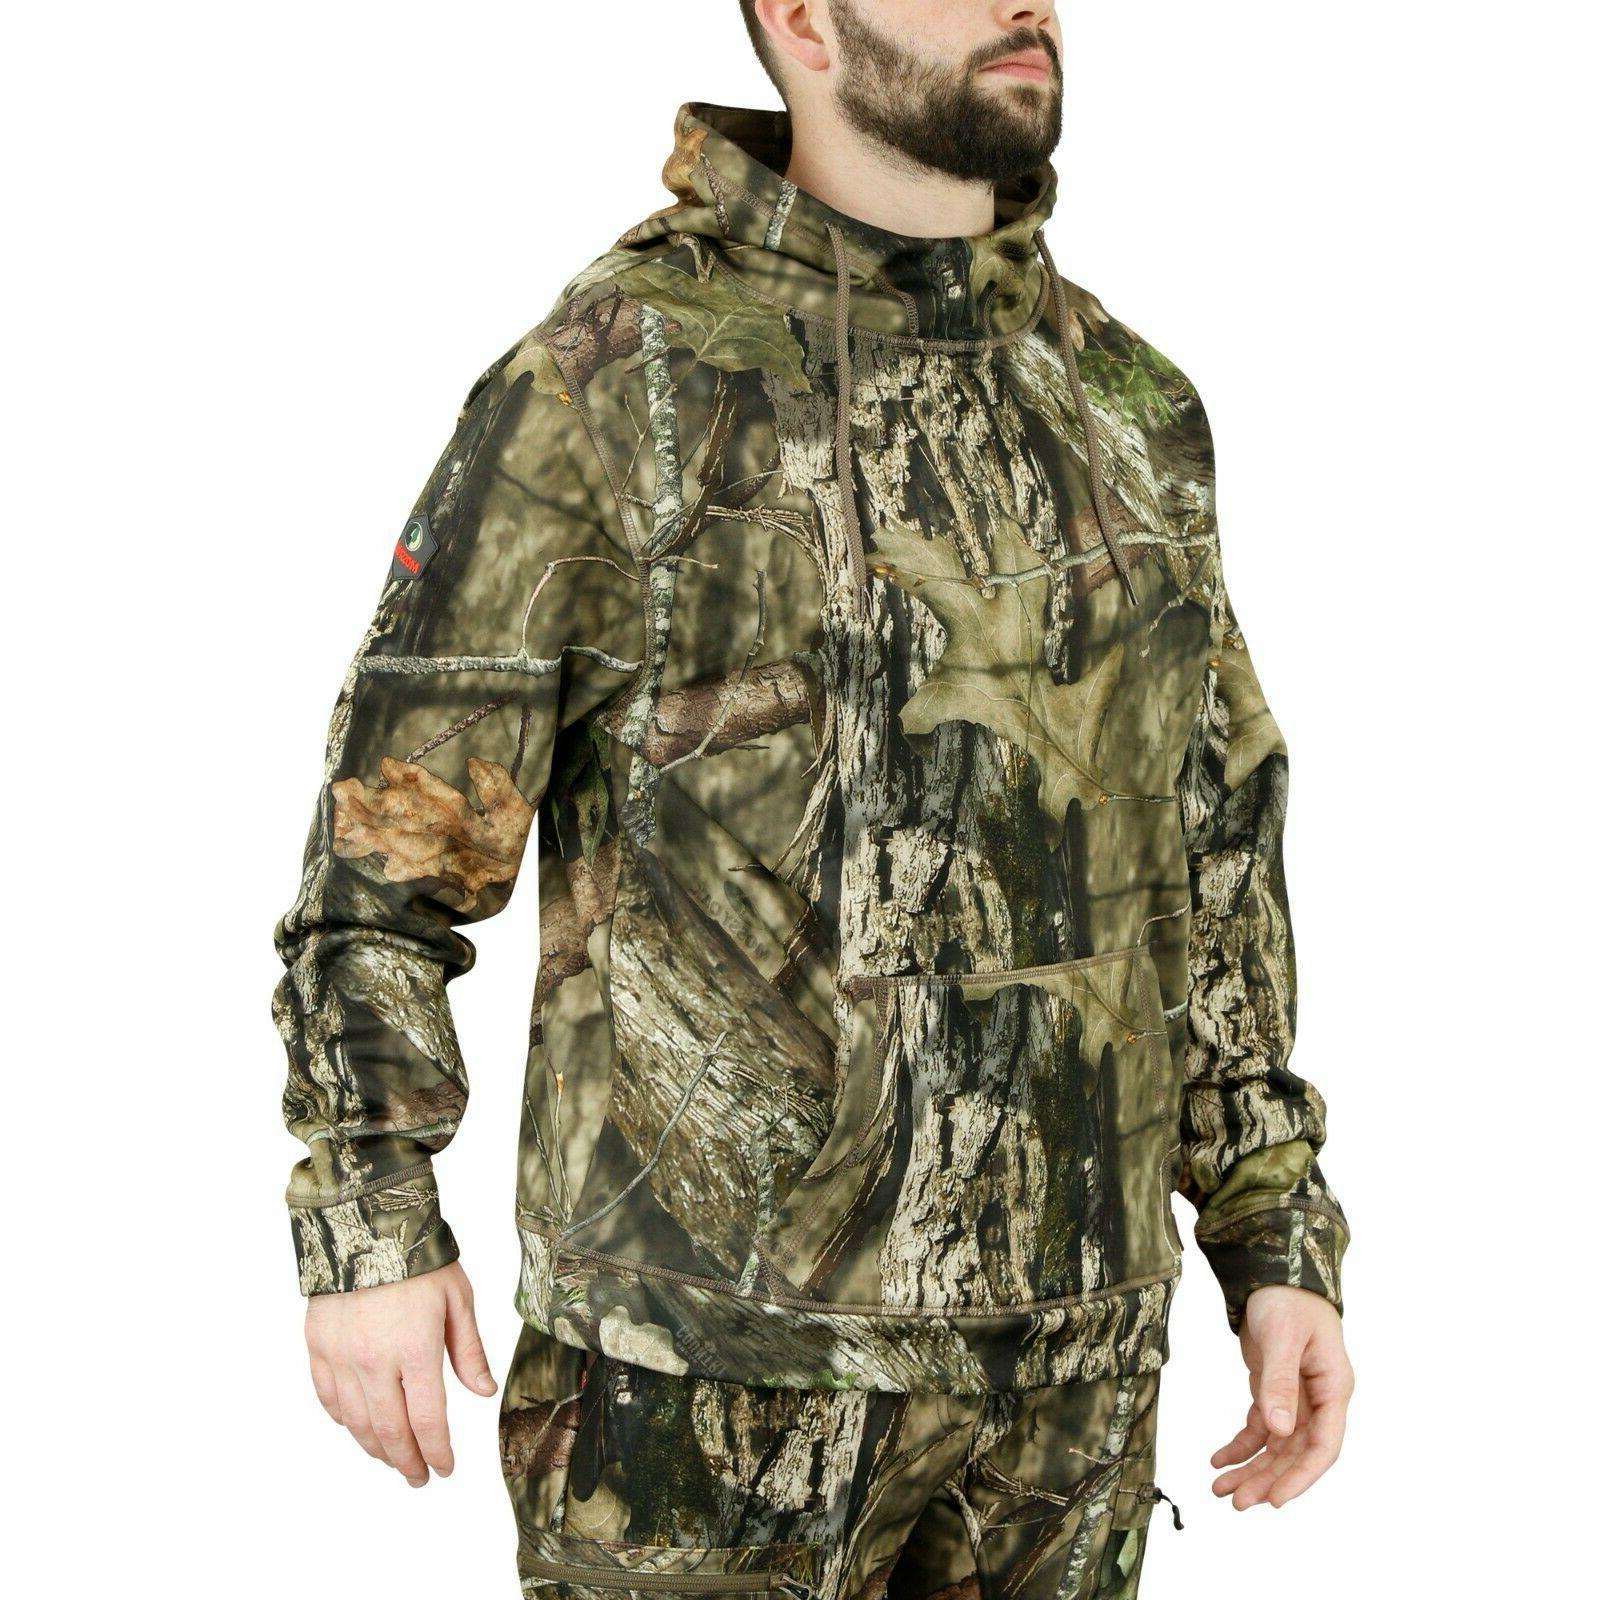 Mossy Fleece Hoodie, Hunting Clothes Men